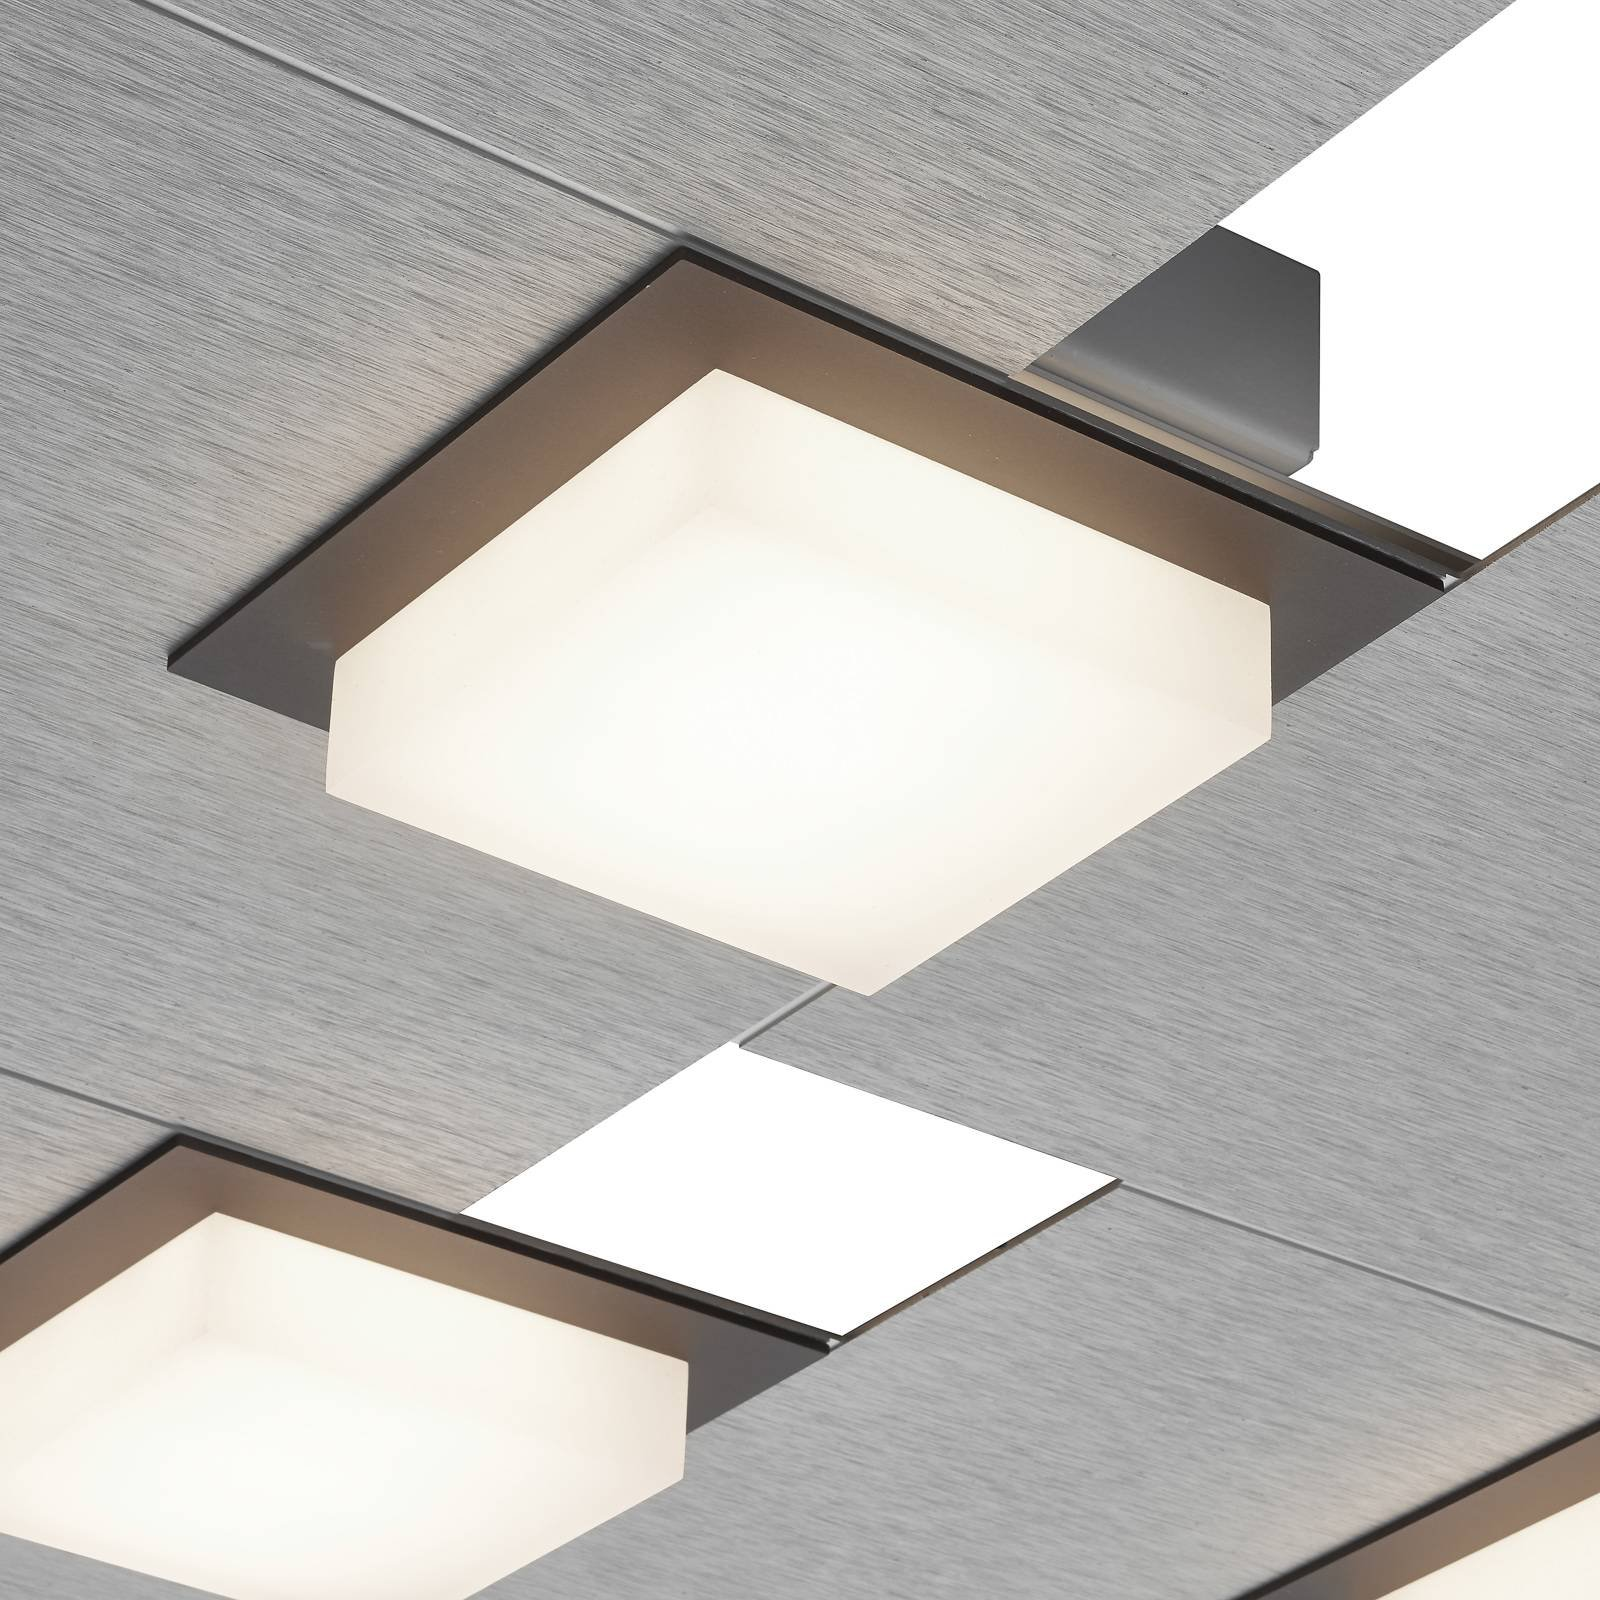 BANKAMP Quadro LED-taklampe 64 W, sølv